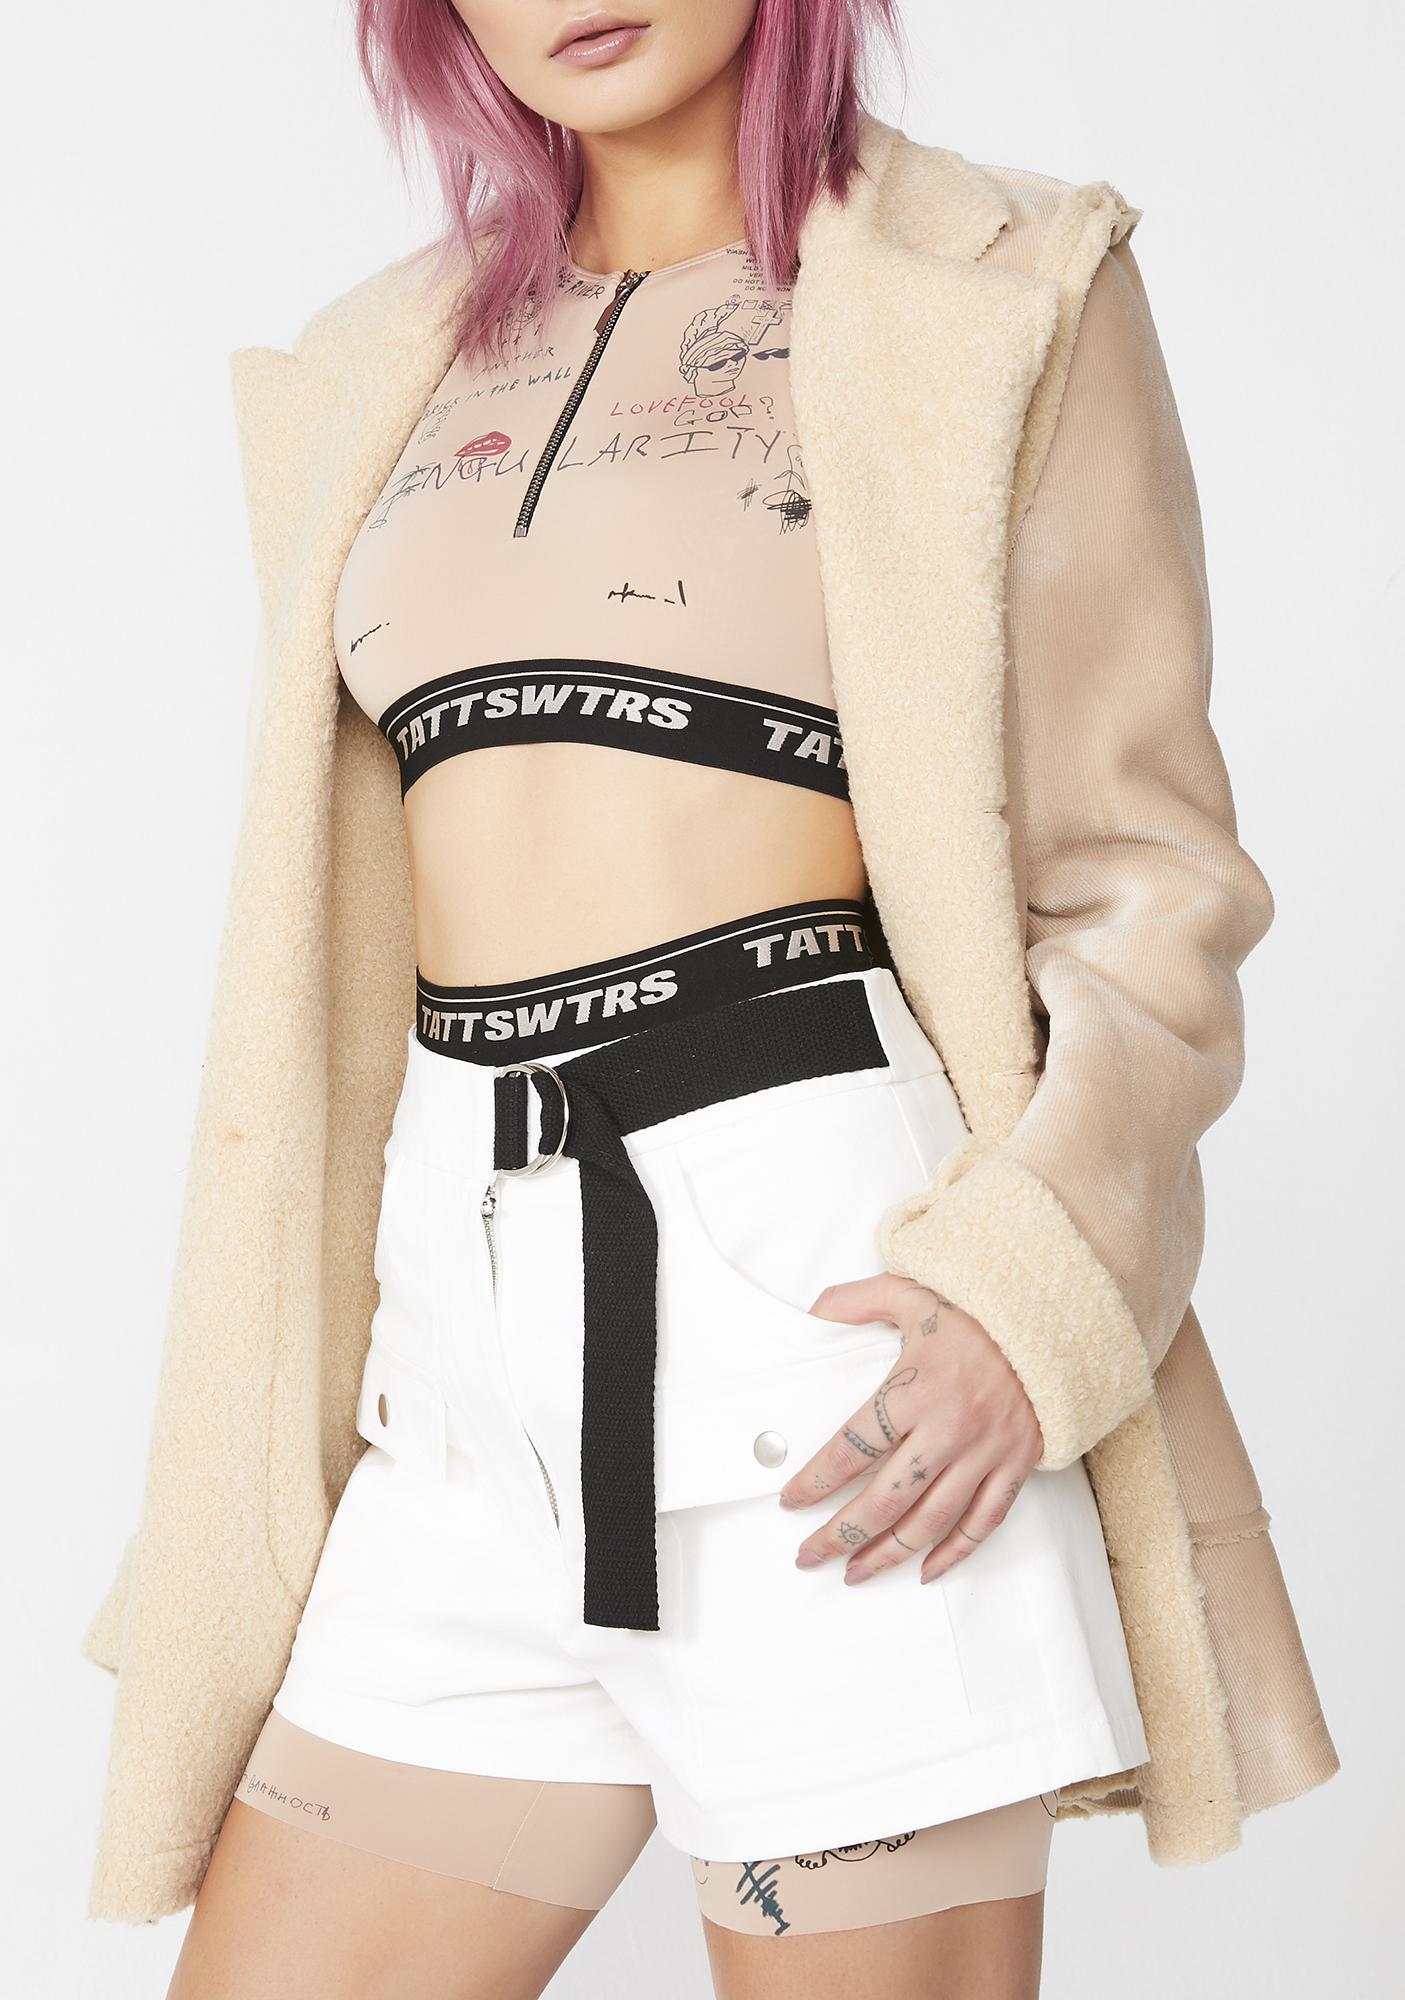 Tiger Mist Aliyah Shorts